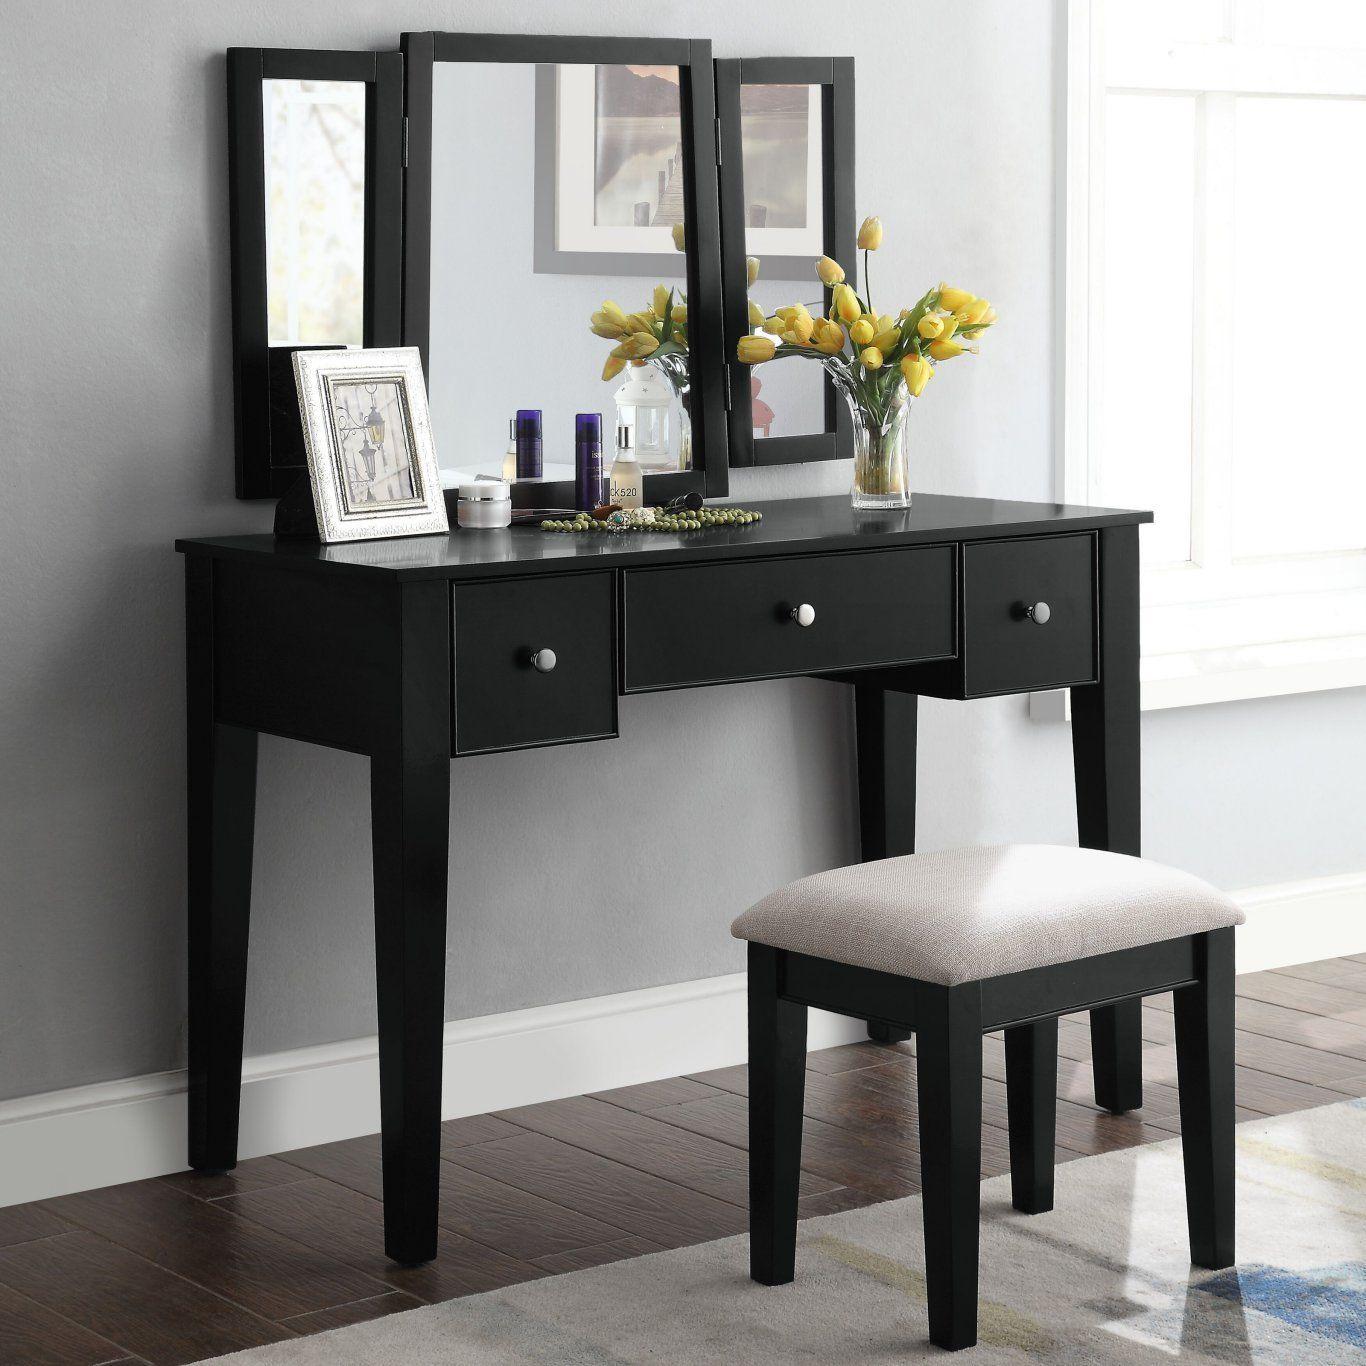 Acme 90360 Severus Black Wood Finish 3 Piece Vanity Desk